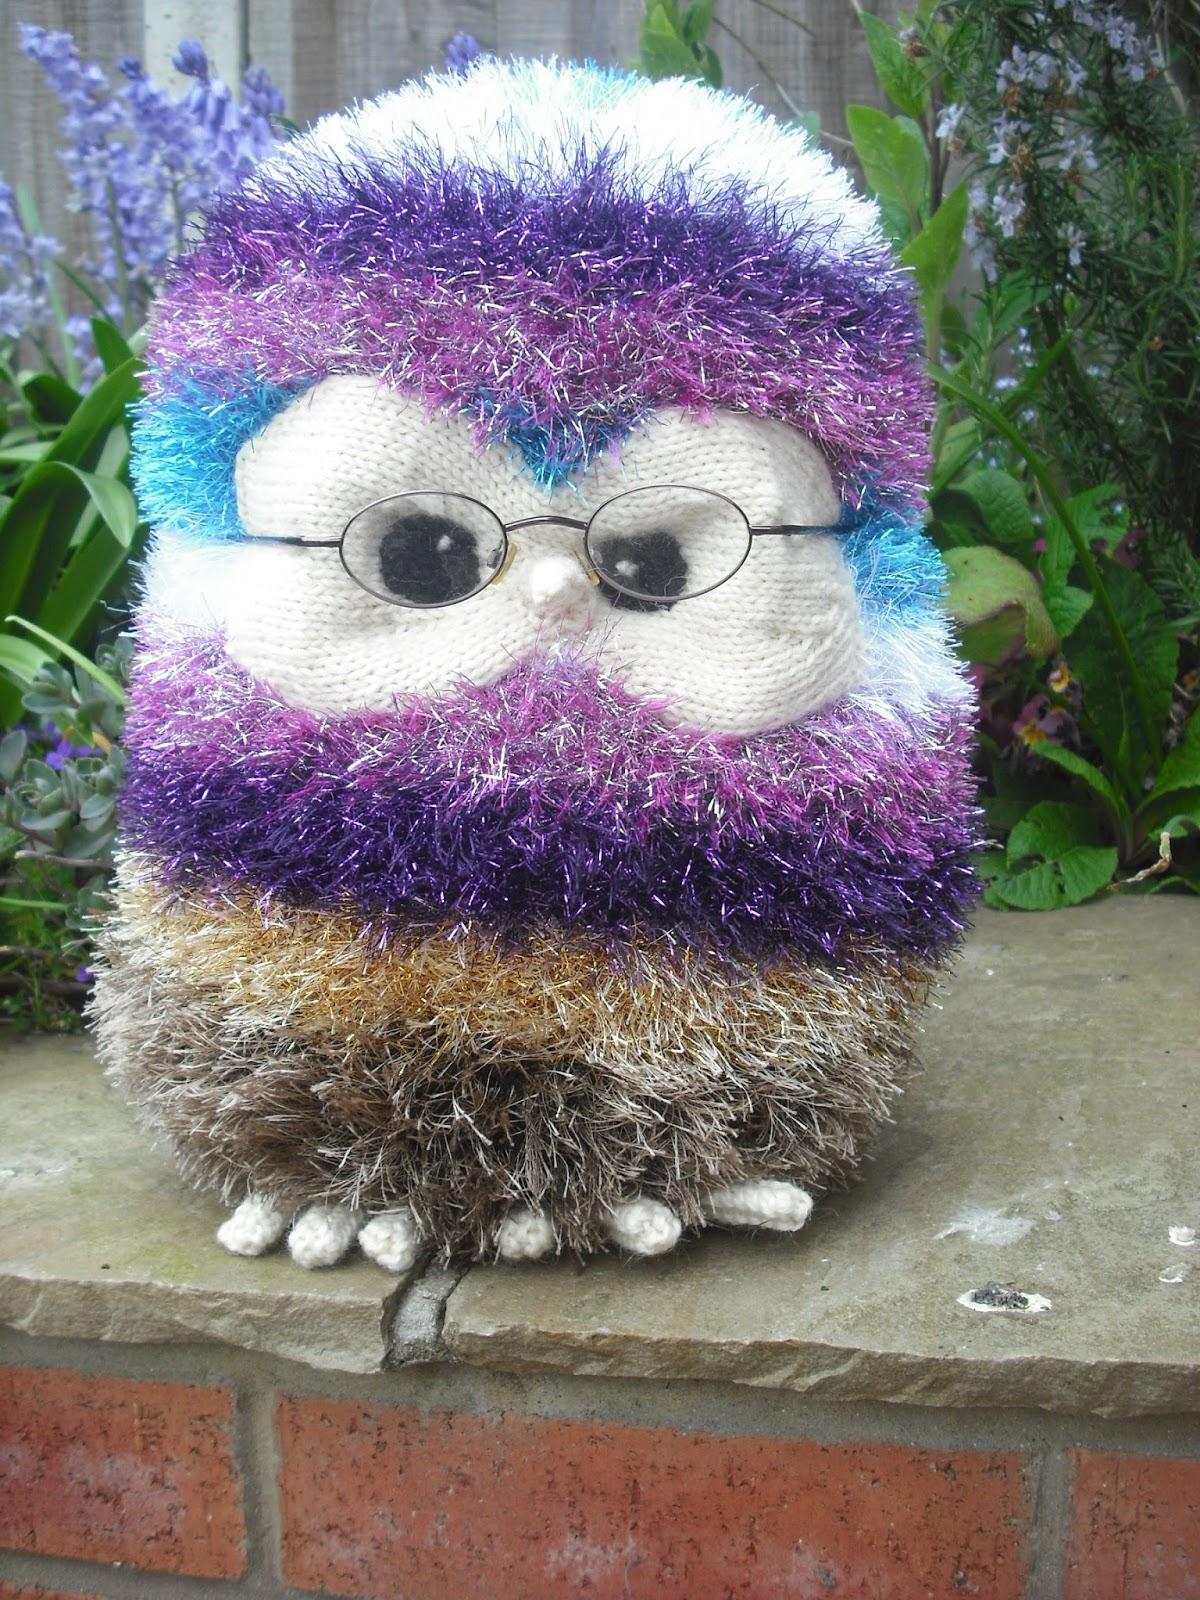 Wool - n - Art: Professor Owl